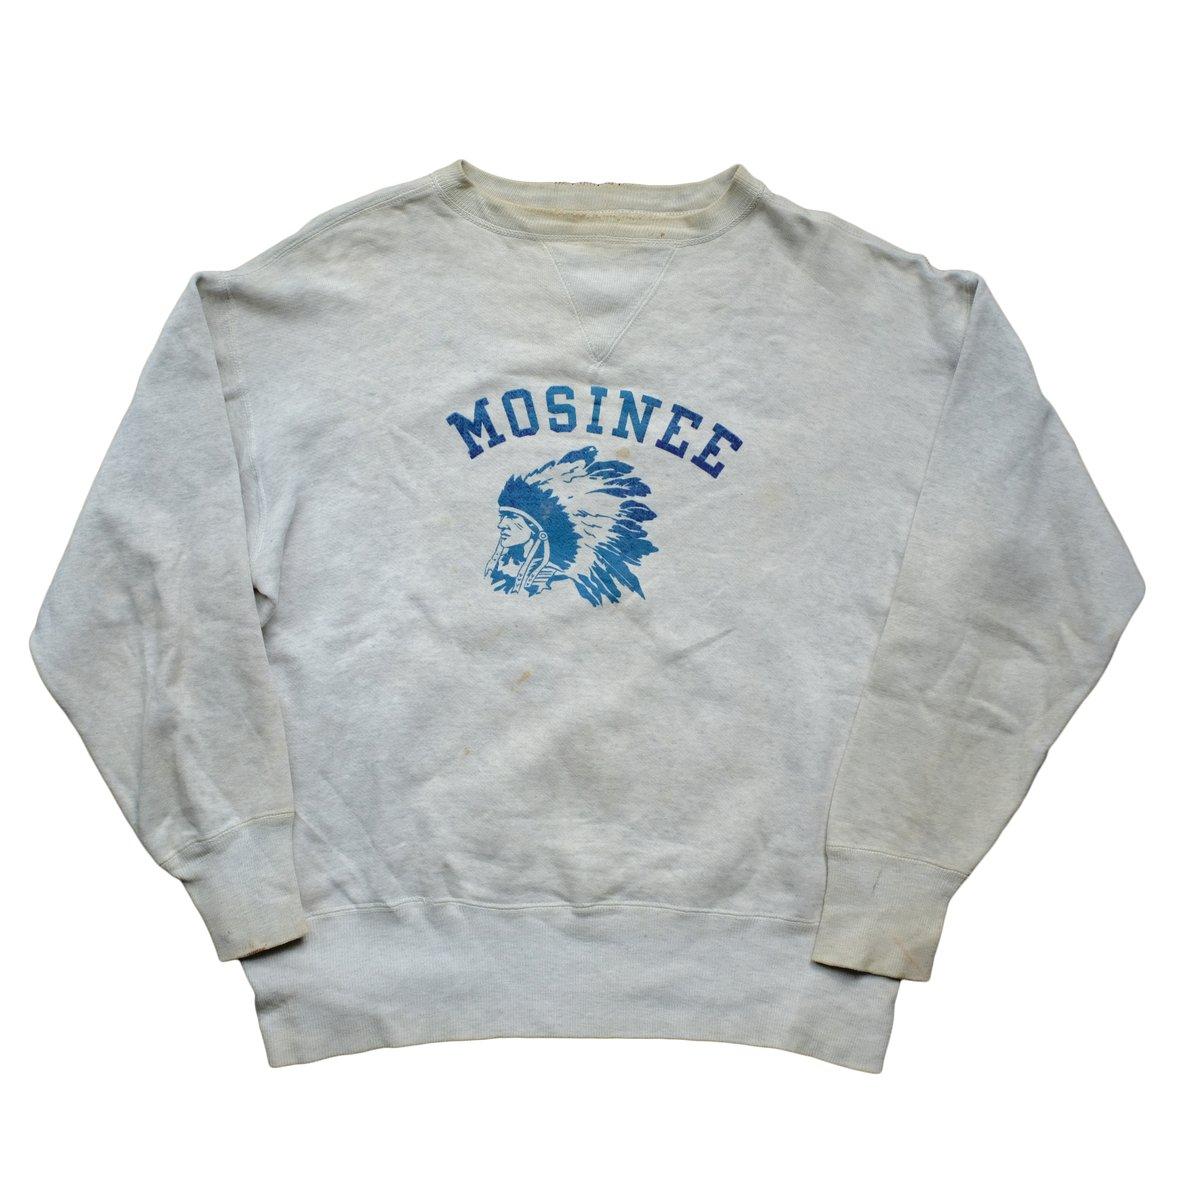 Image of 1940's Vintage Double V Flocked Indian Print Sweatshirt